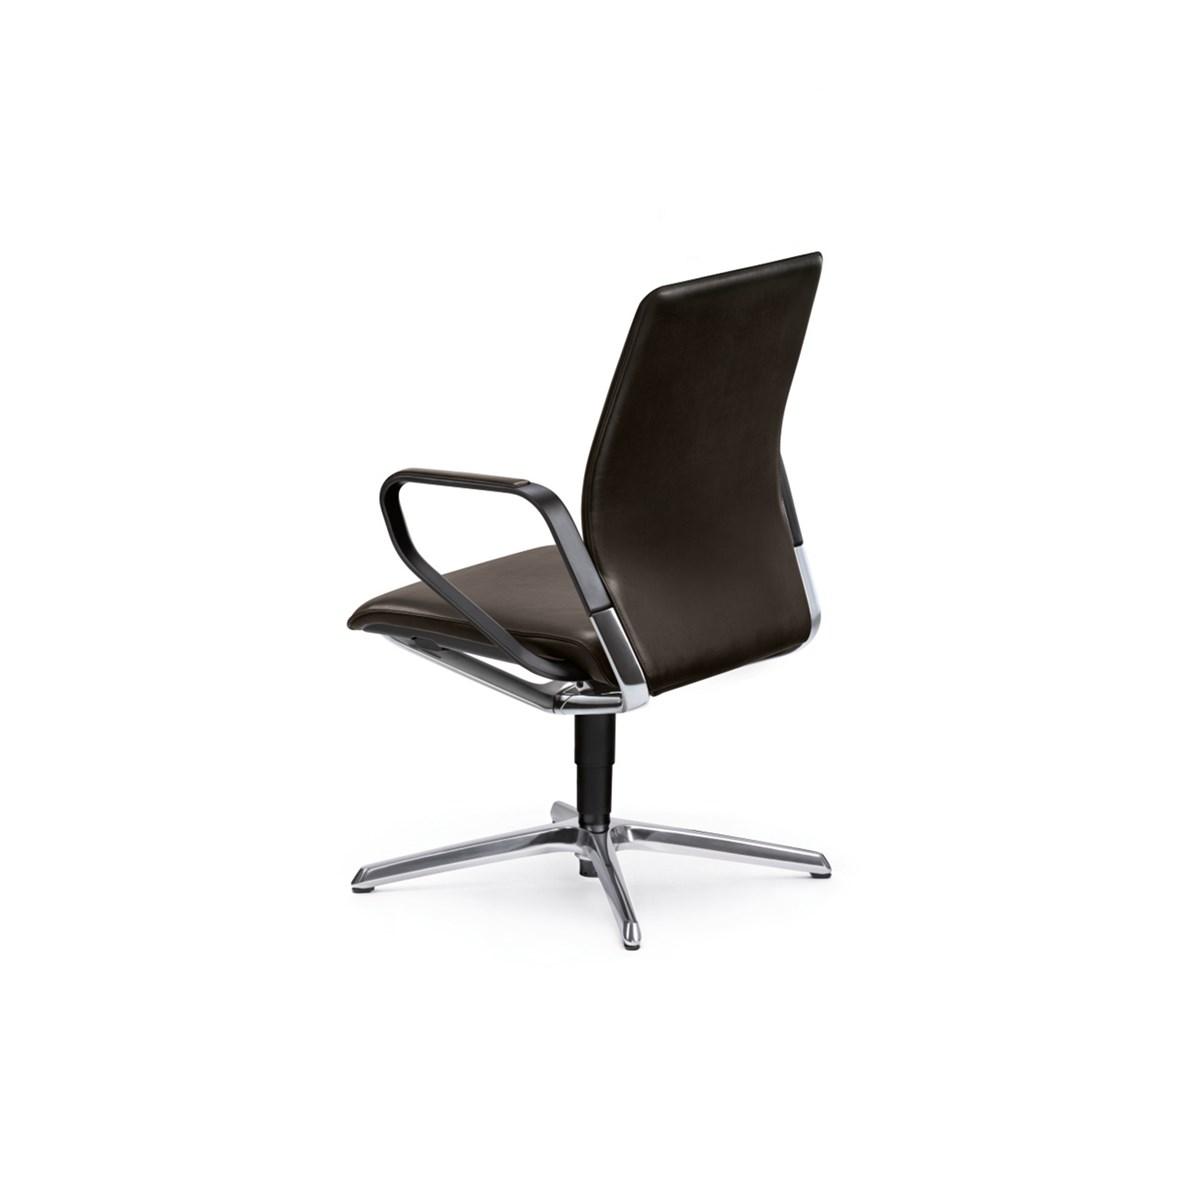 Sedus-Se:line-Meeting-Chair-Matisse-2